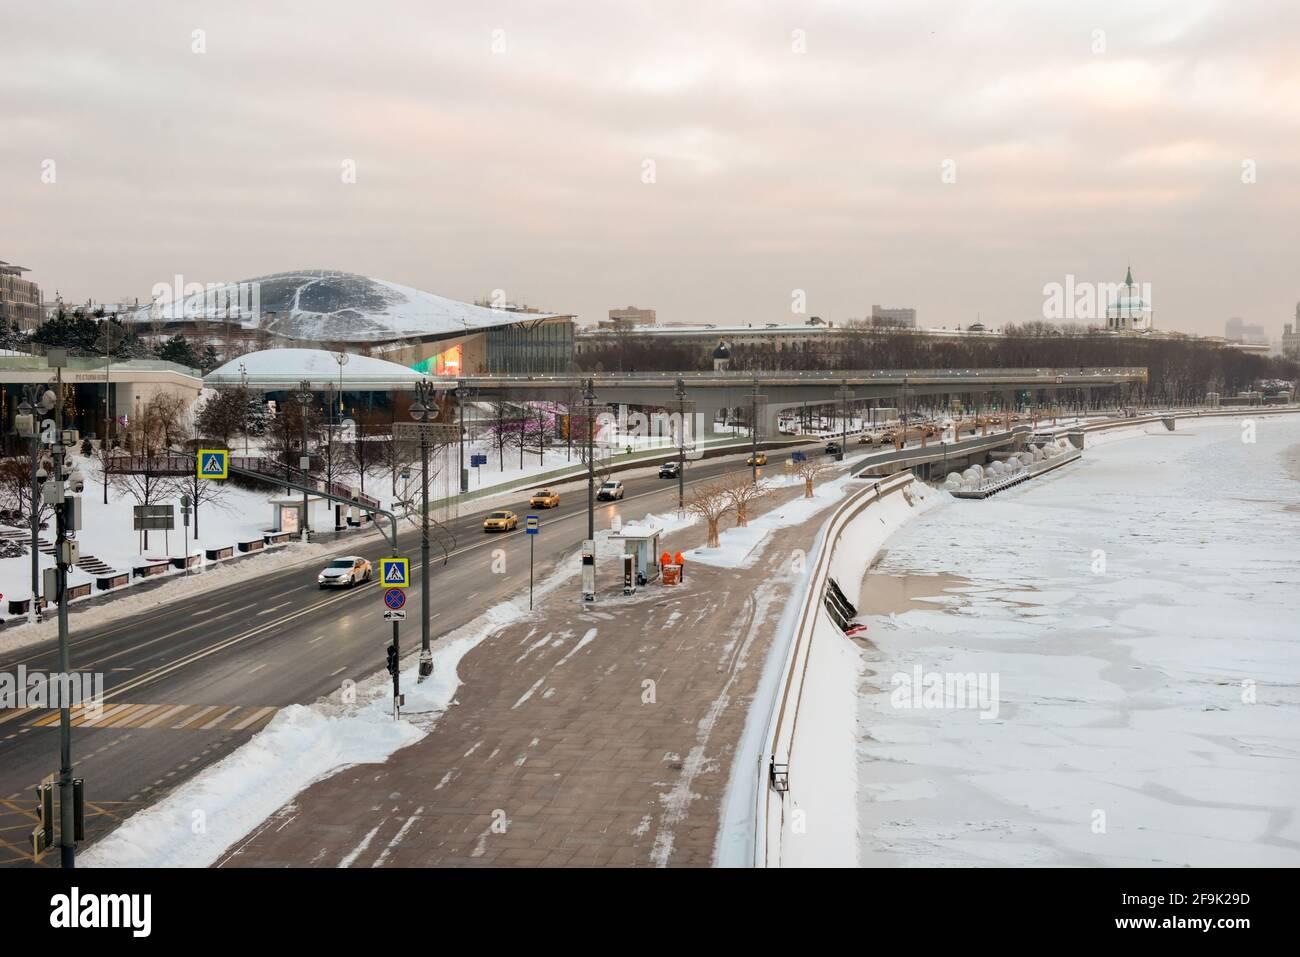 Moscow, Russia - January 17, 2021: View of the Moskvoretskaya embankment, cars and a skyscraper on Kotelnicheskaya embankment on a frosty winter morni Stock Photo